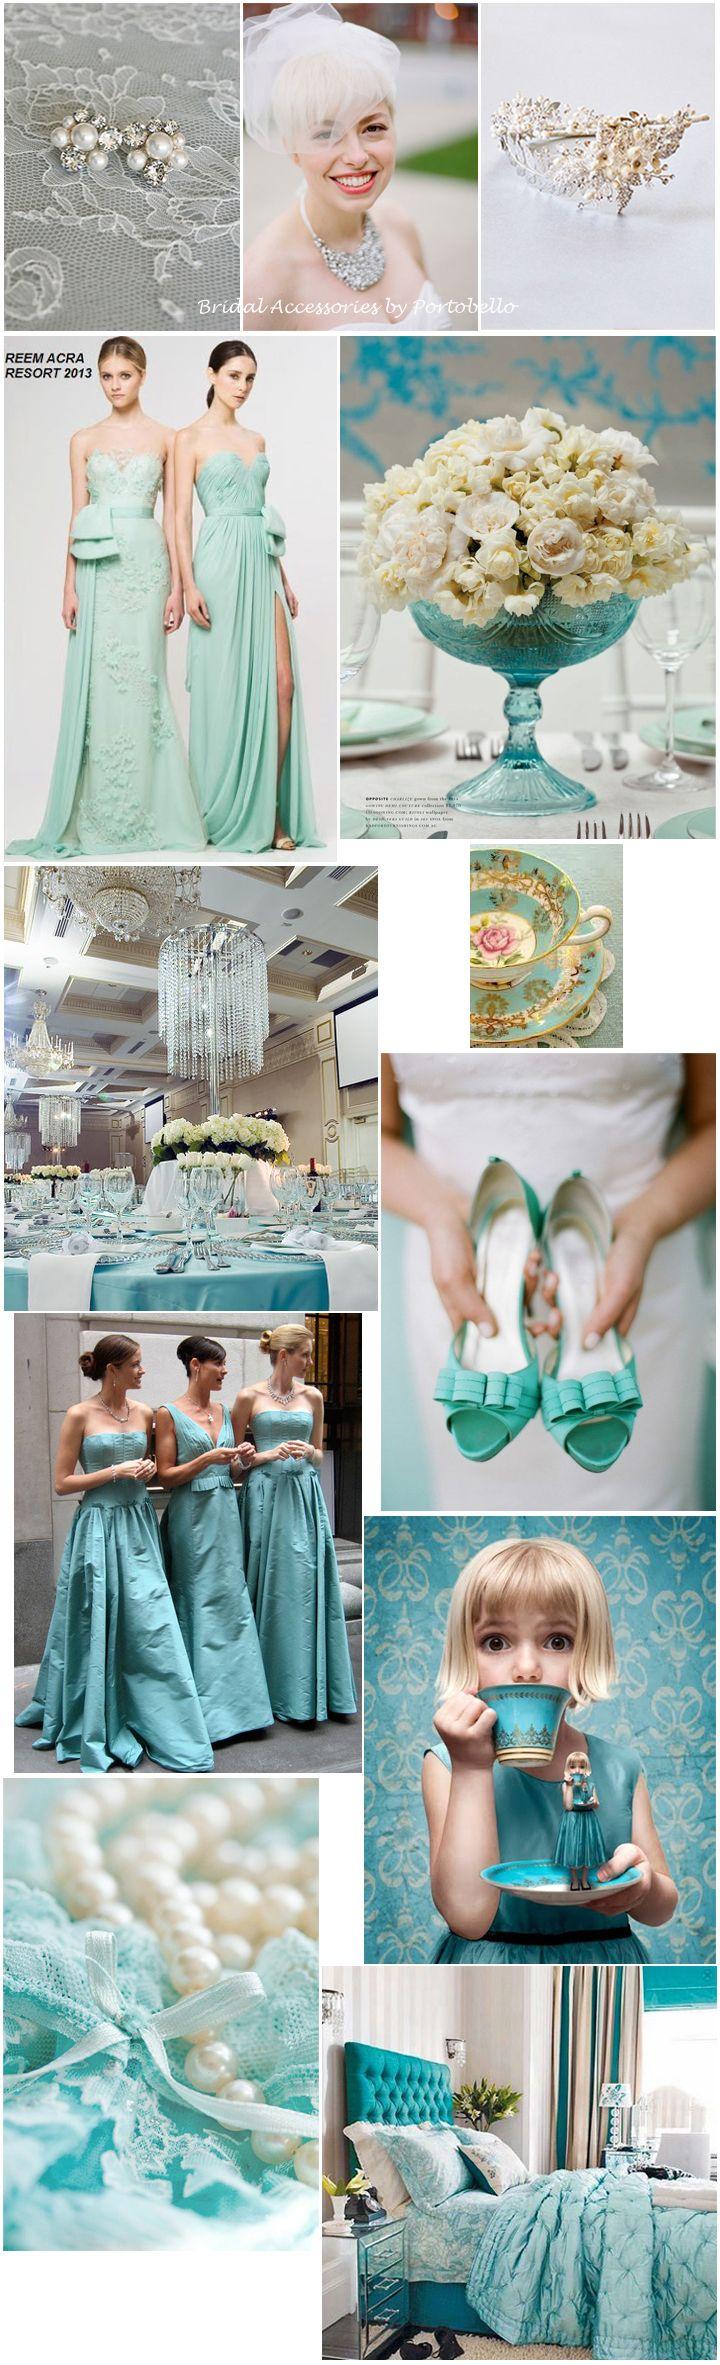 Tiffany Blue Wedding Theme / portobellojewelry.com